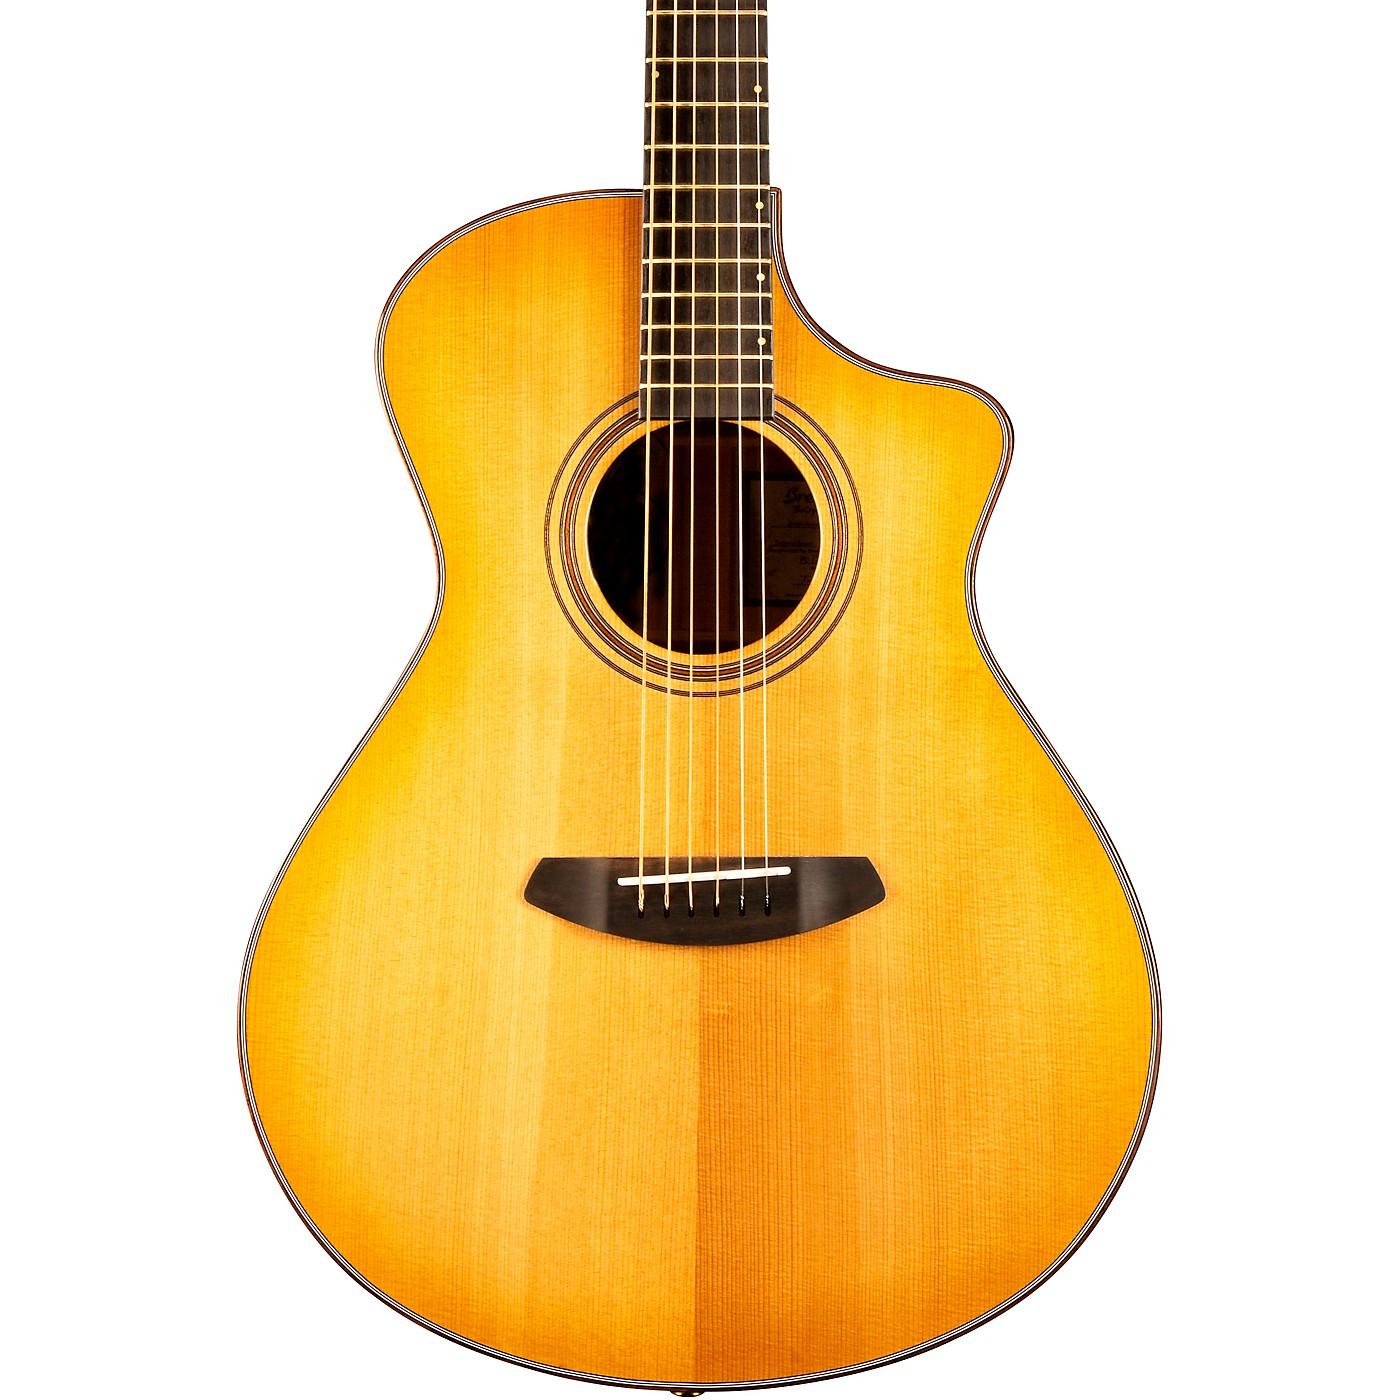 Breedlove Organic Collection Artista Concert Cutaway CE Acoustic-Electric Guitar thumbnail